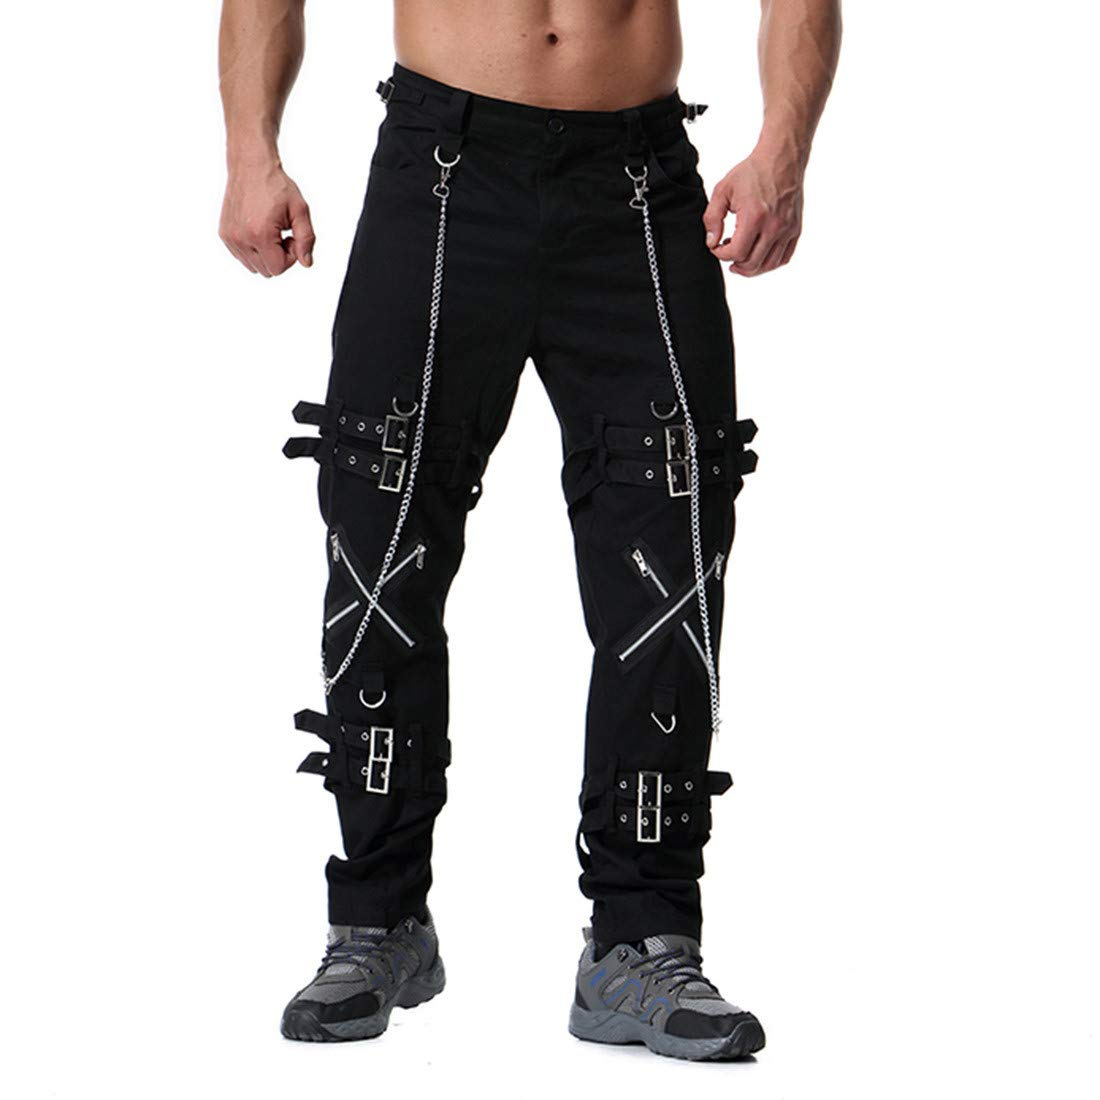 Personalidad Pantalones, Briskorry Pantalón Pitillo Gran Tamaño ...